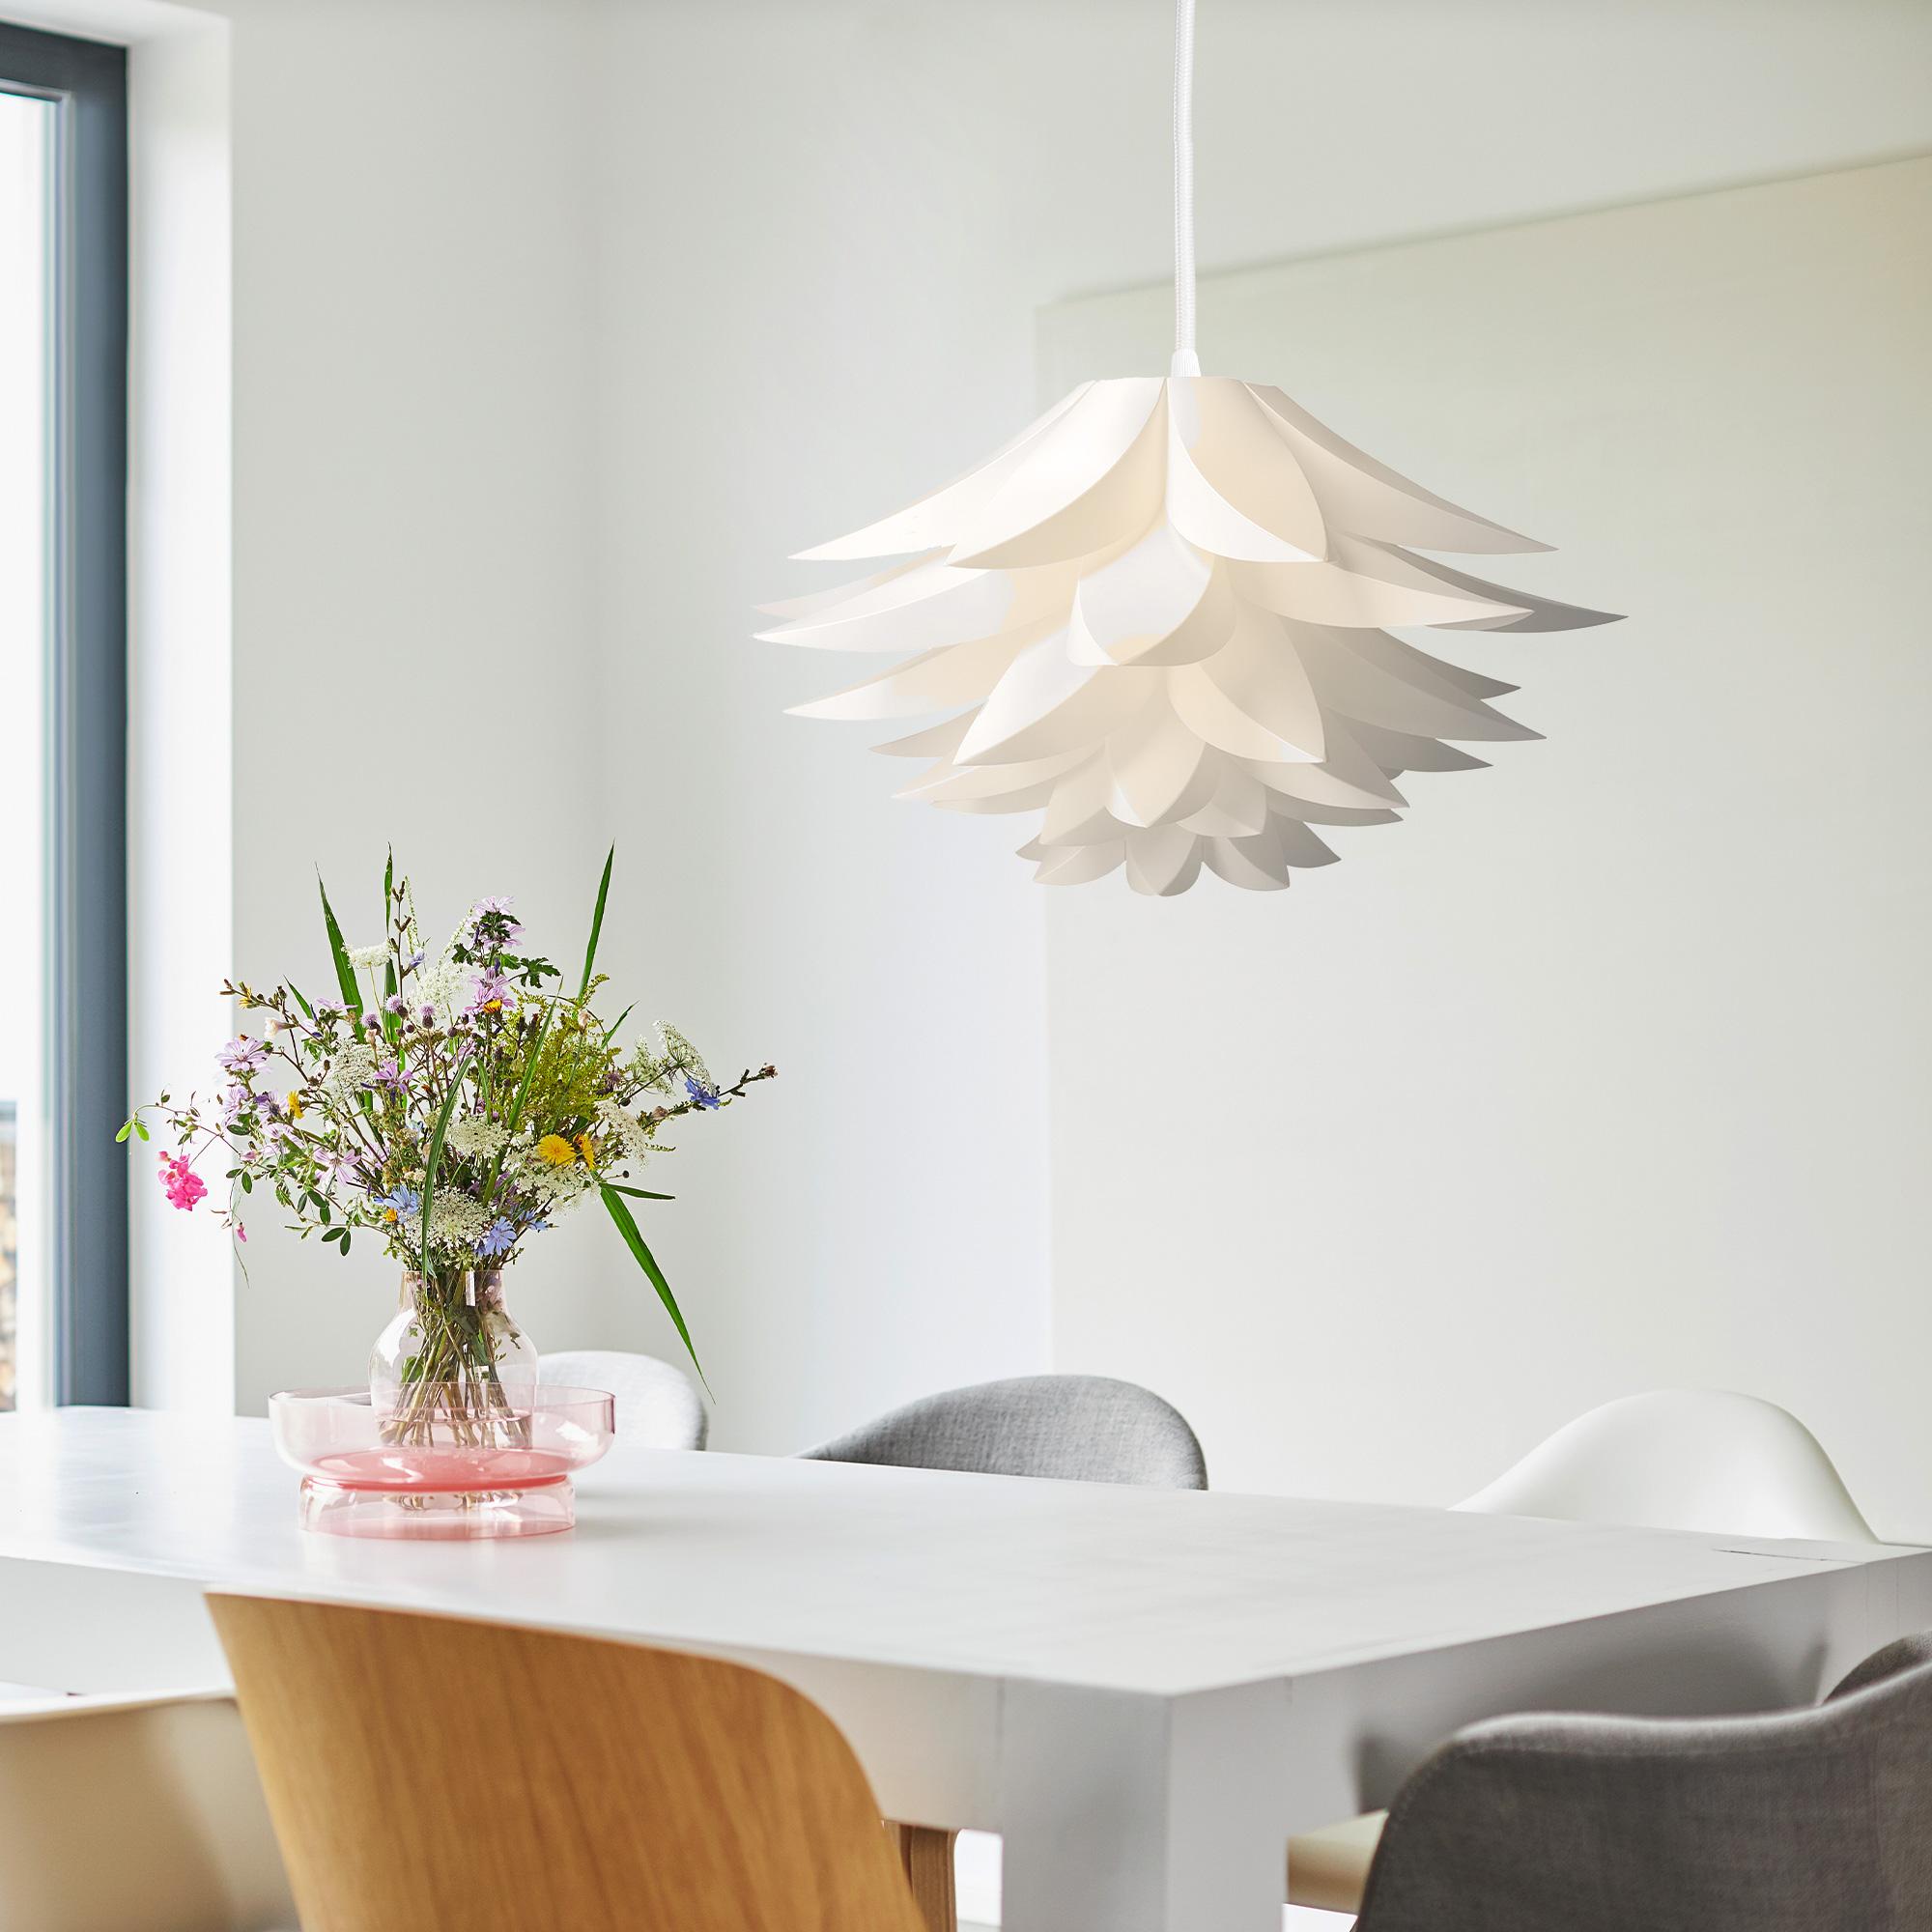 diy lampe puzzle lampenschirm lotus design schirm deckenlampe max 50cm wei ebay. Black Bedroom Furniture Sets. Home Design Ideas